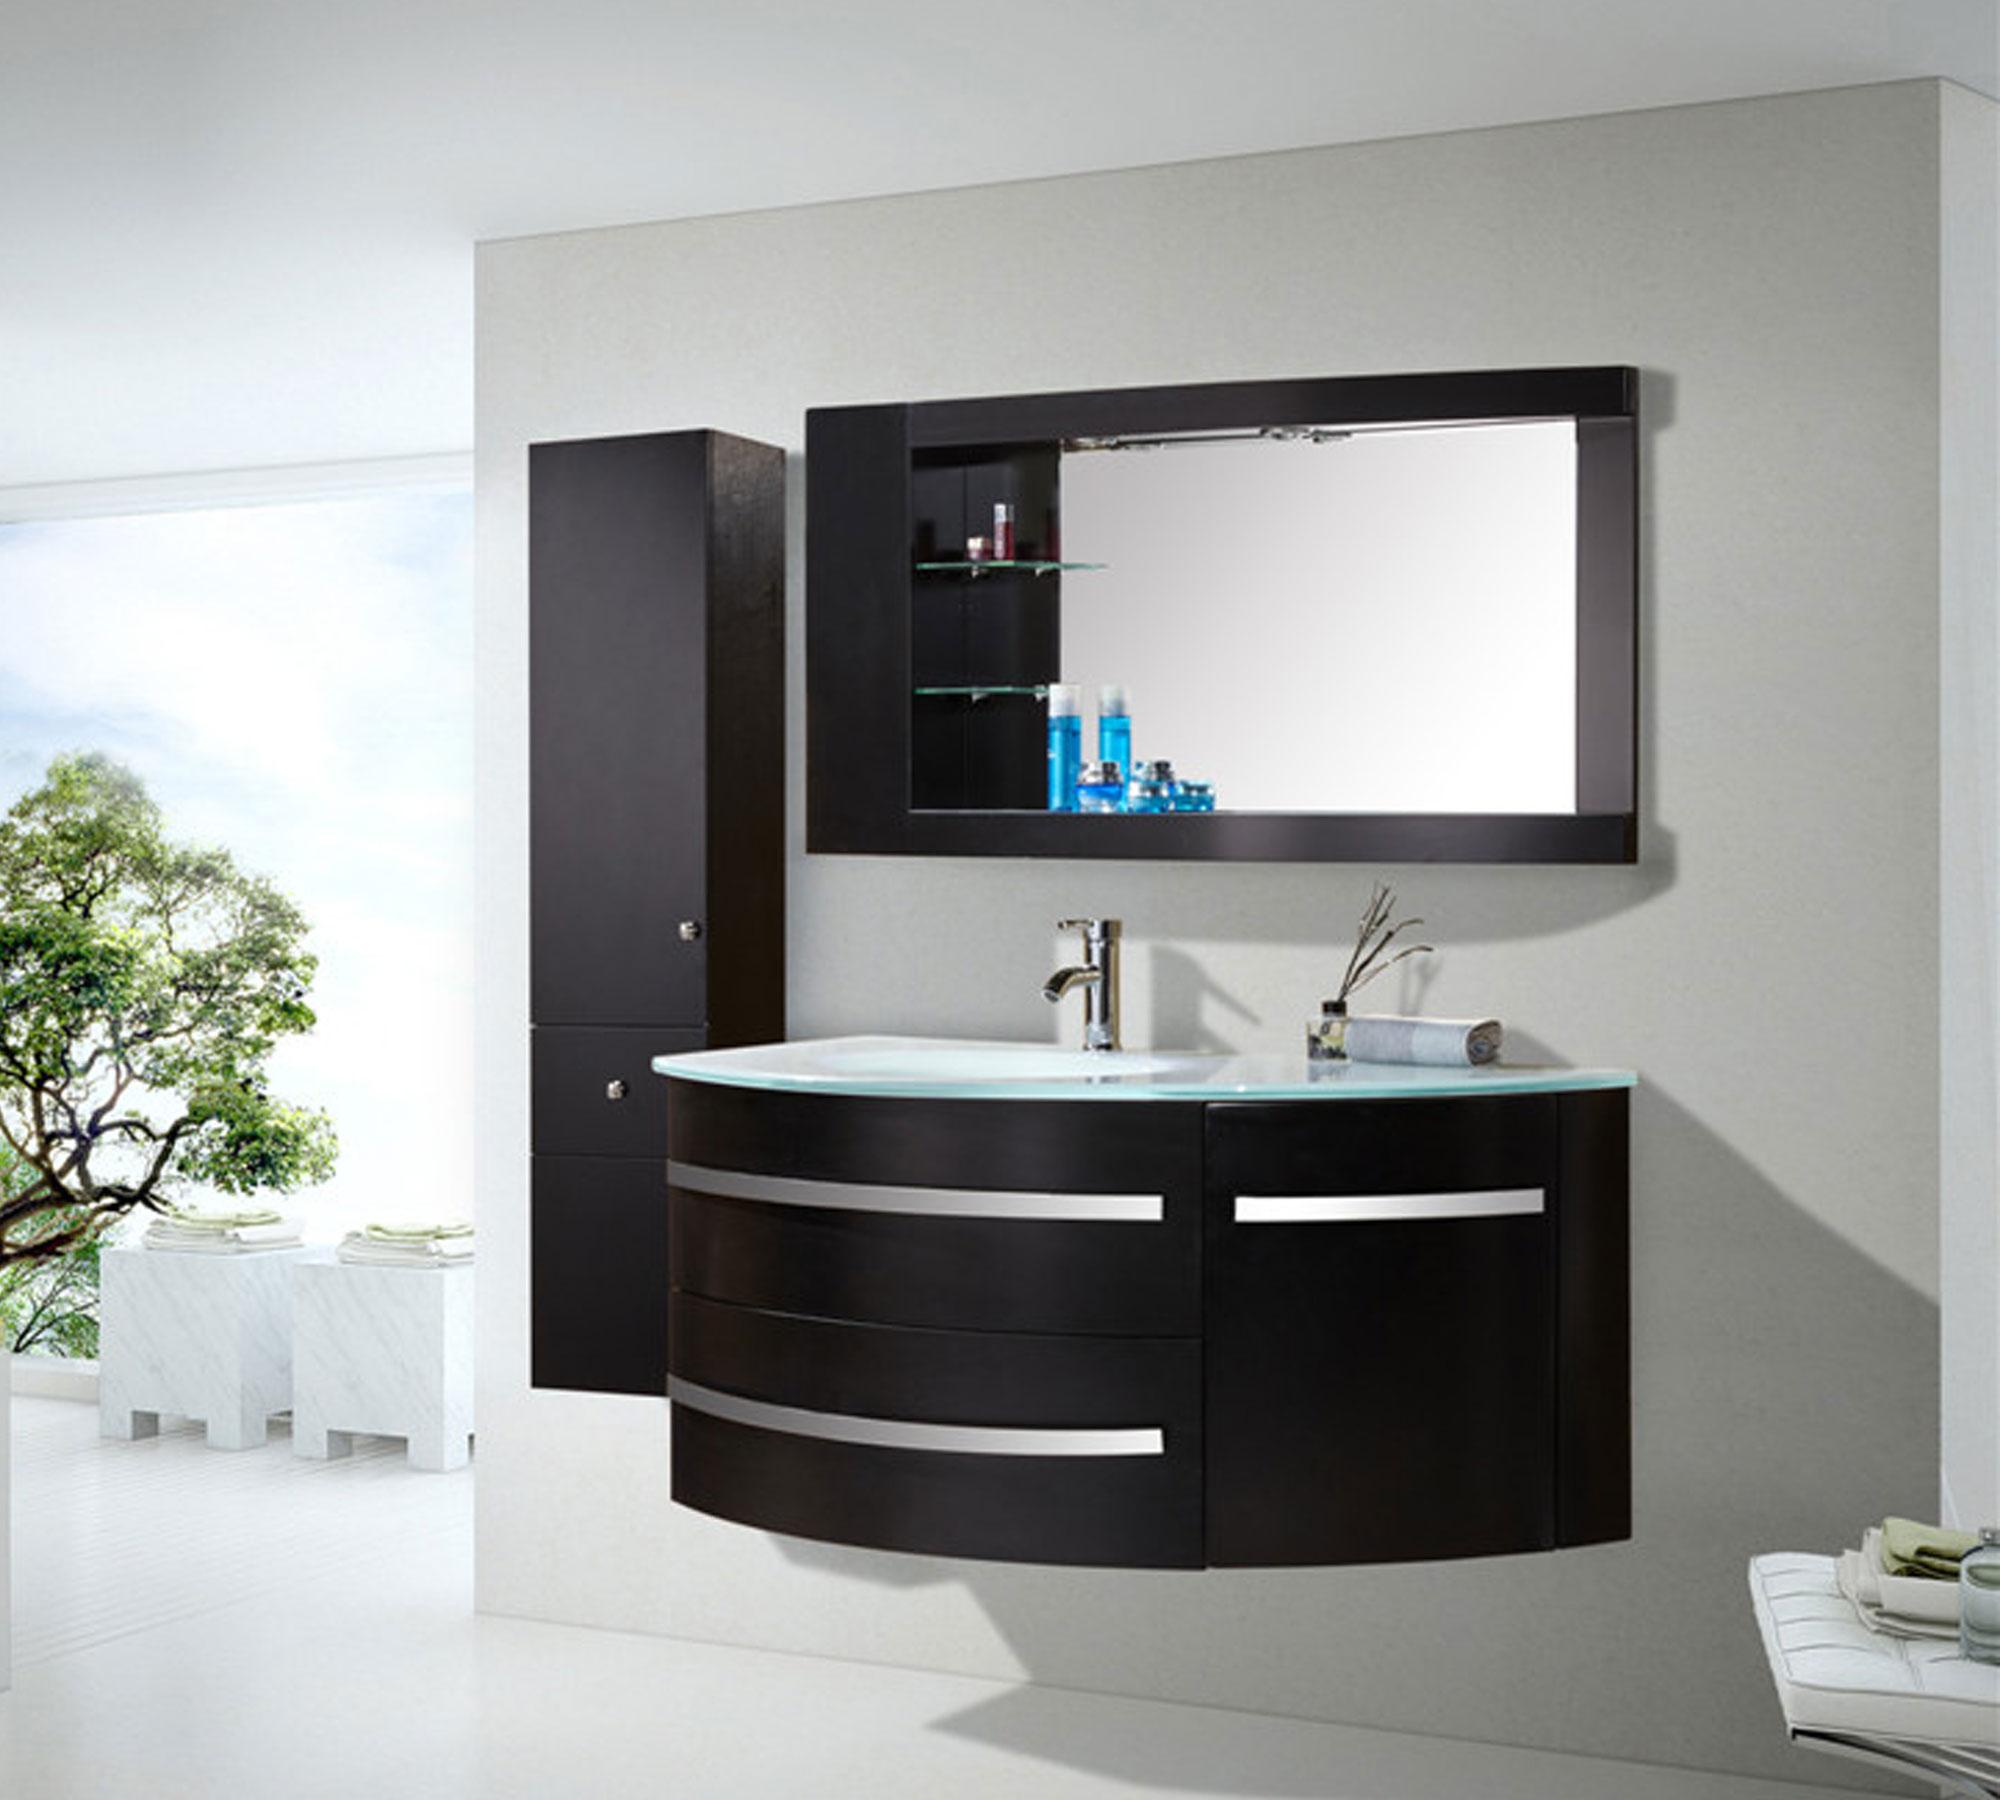 Awesome mobili bagno senza lavabo gallery - Mobile bagno sottolavabo ...